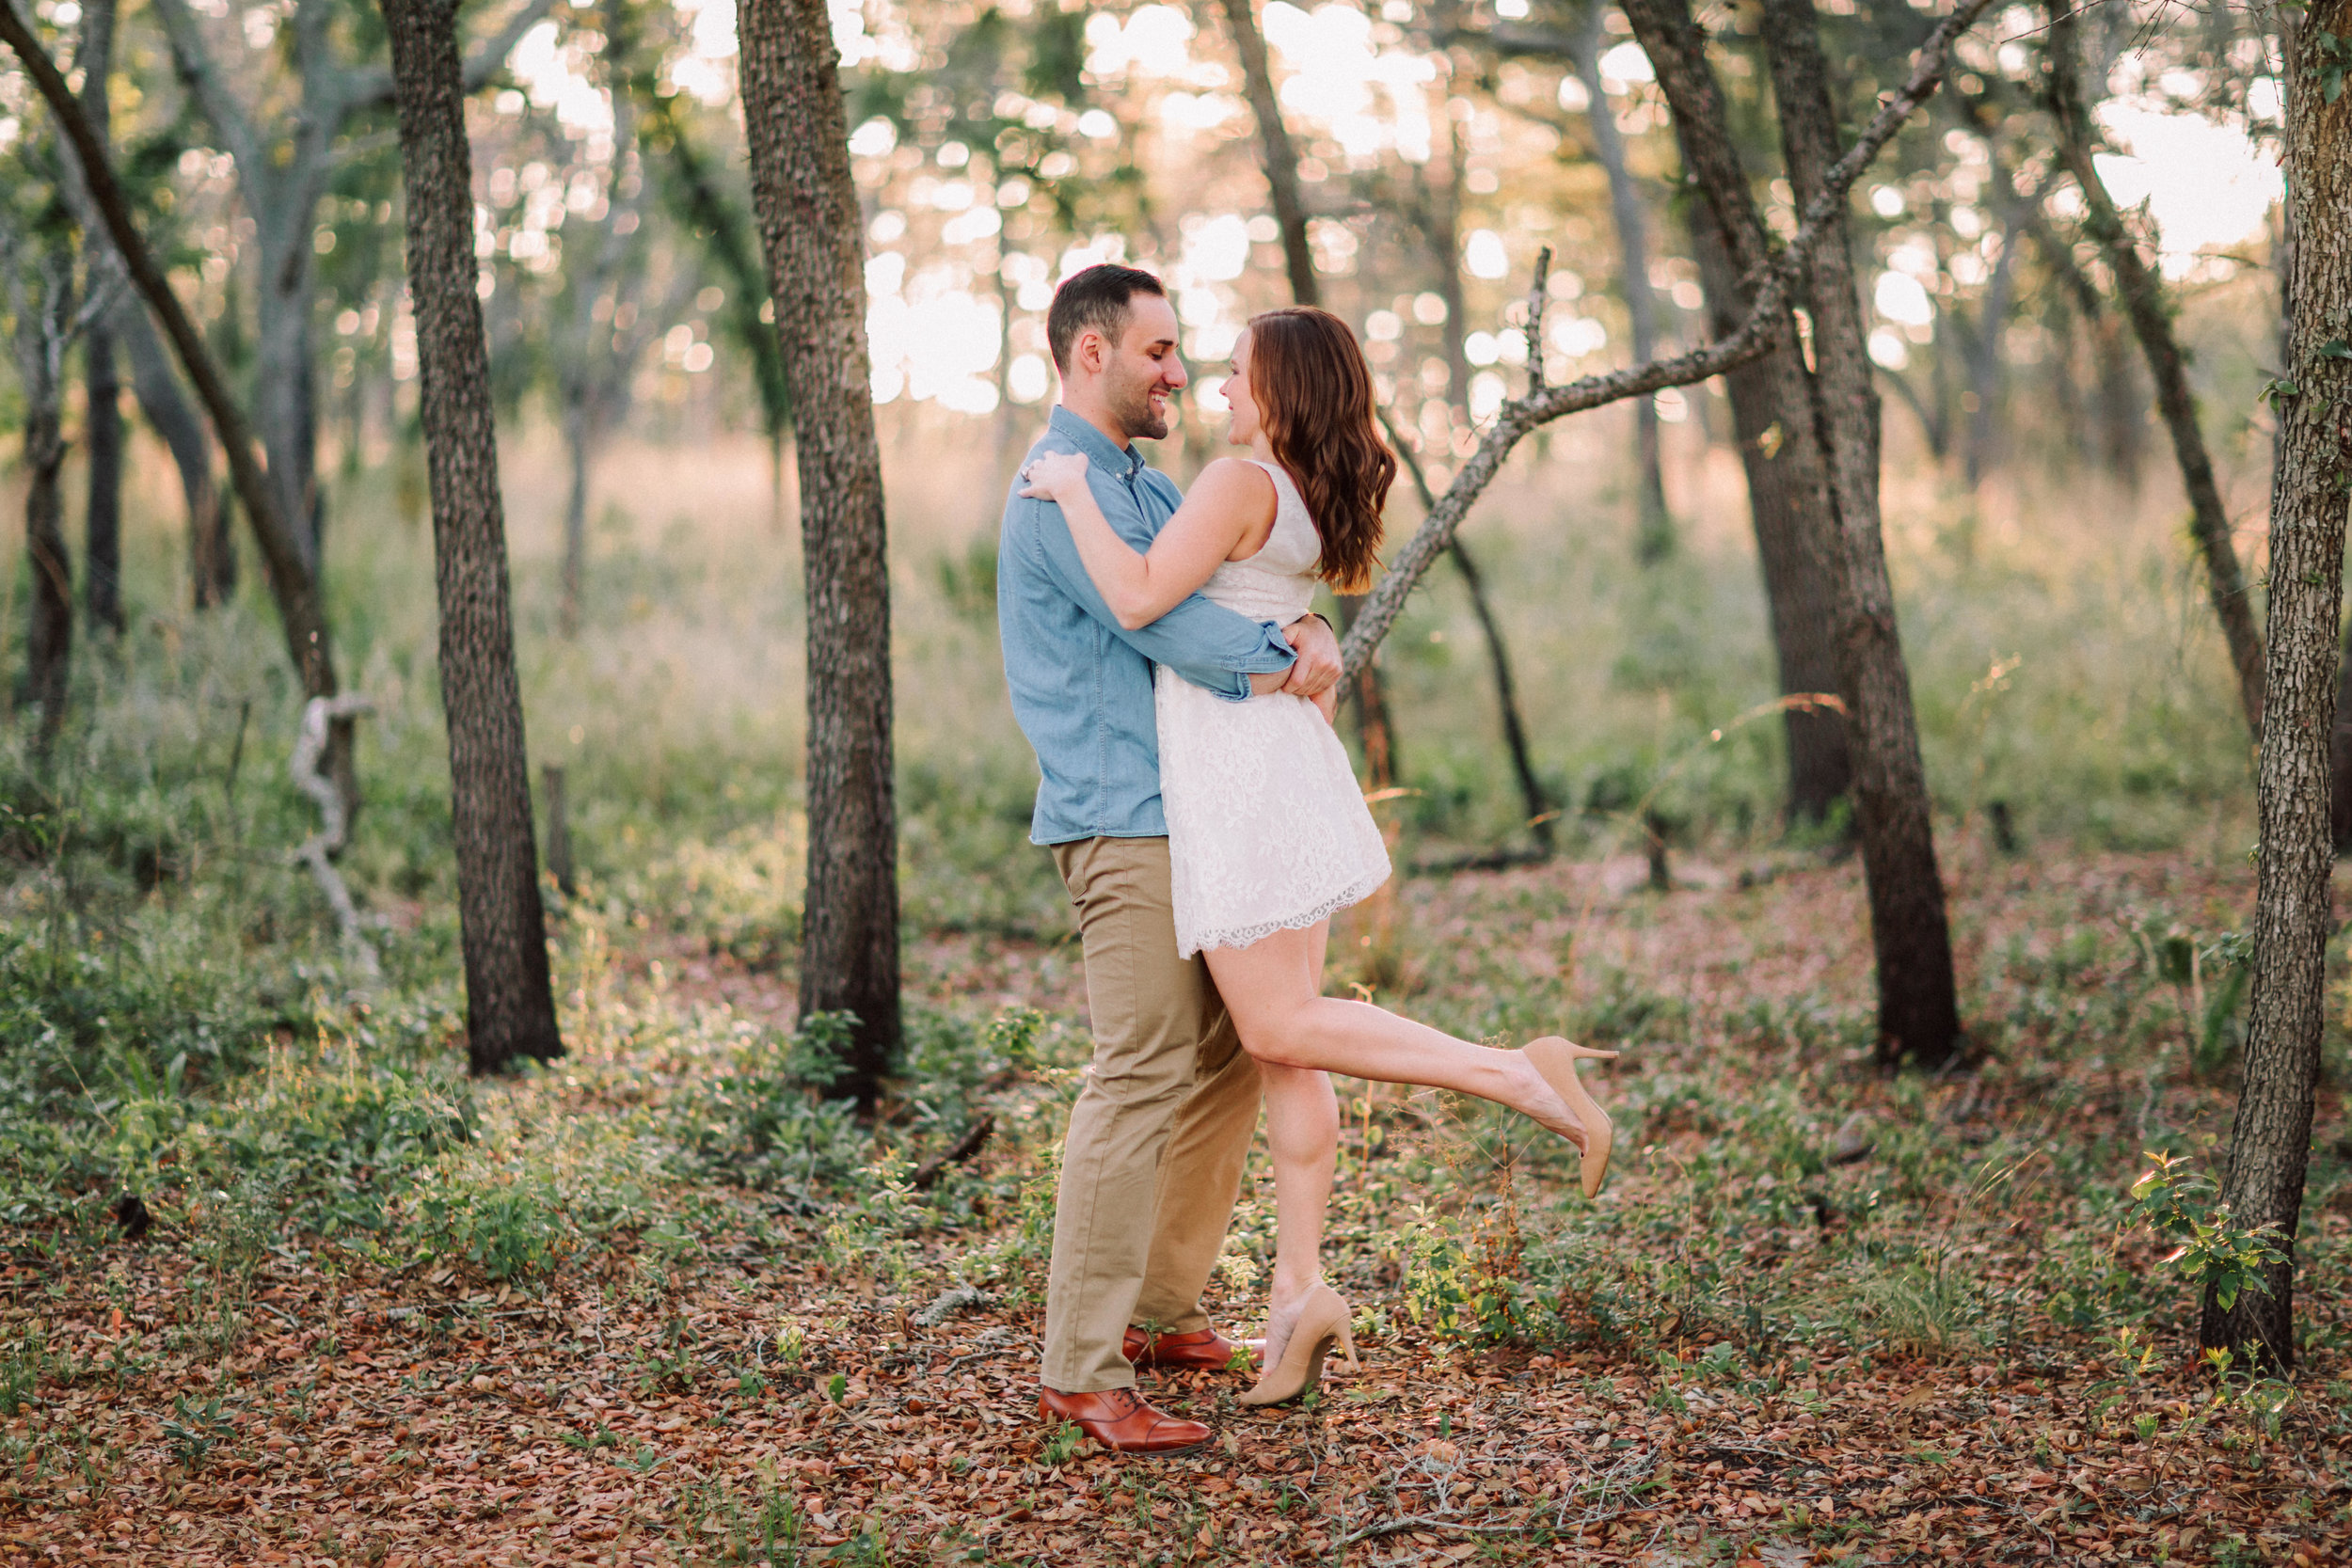 Orlando Engagement session at Wekiva Springs State Park nature-Anthony + Christine 23.jpg